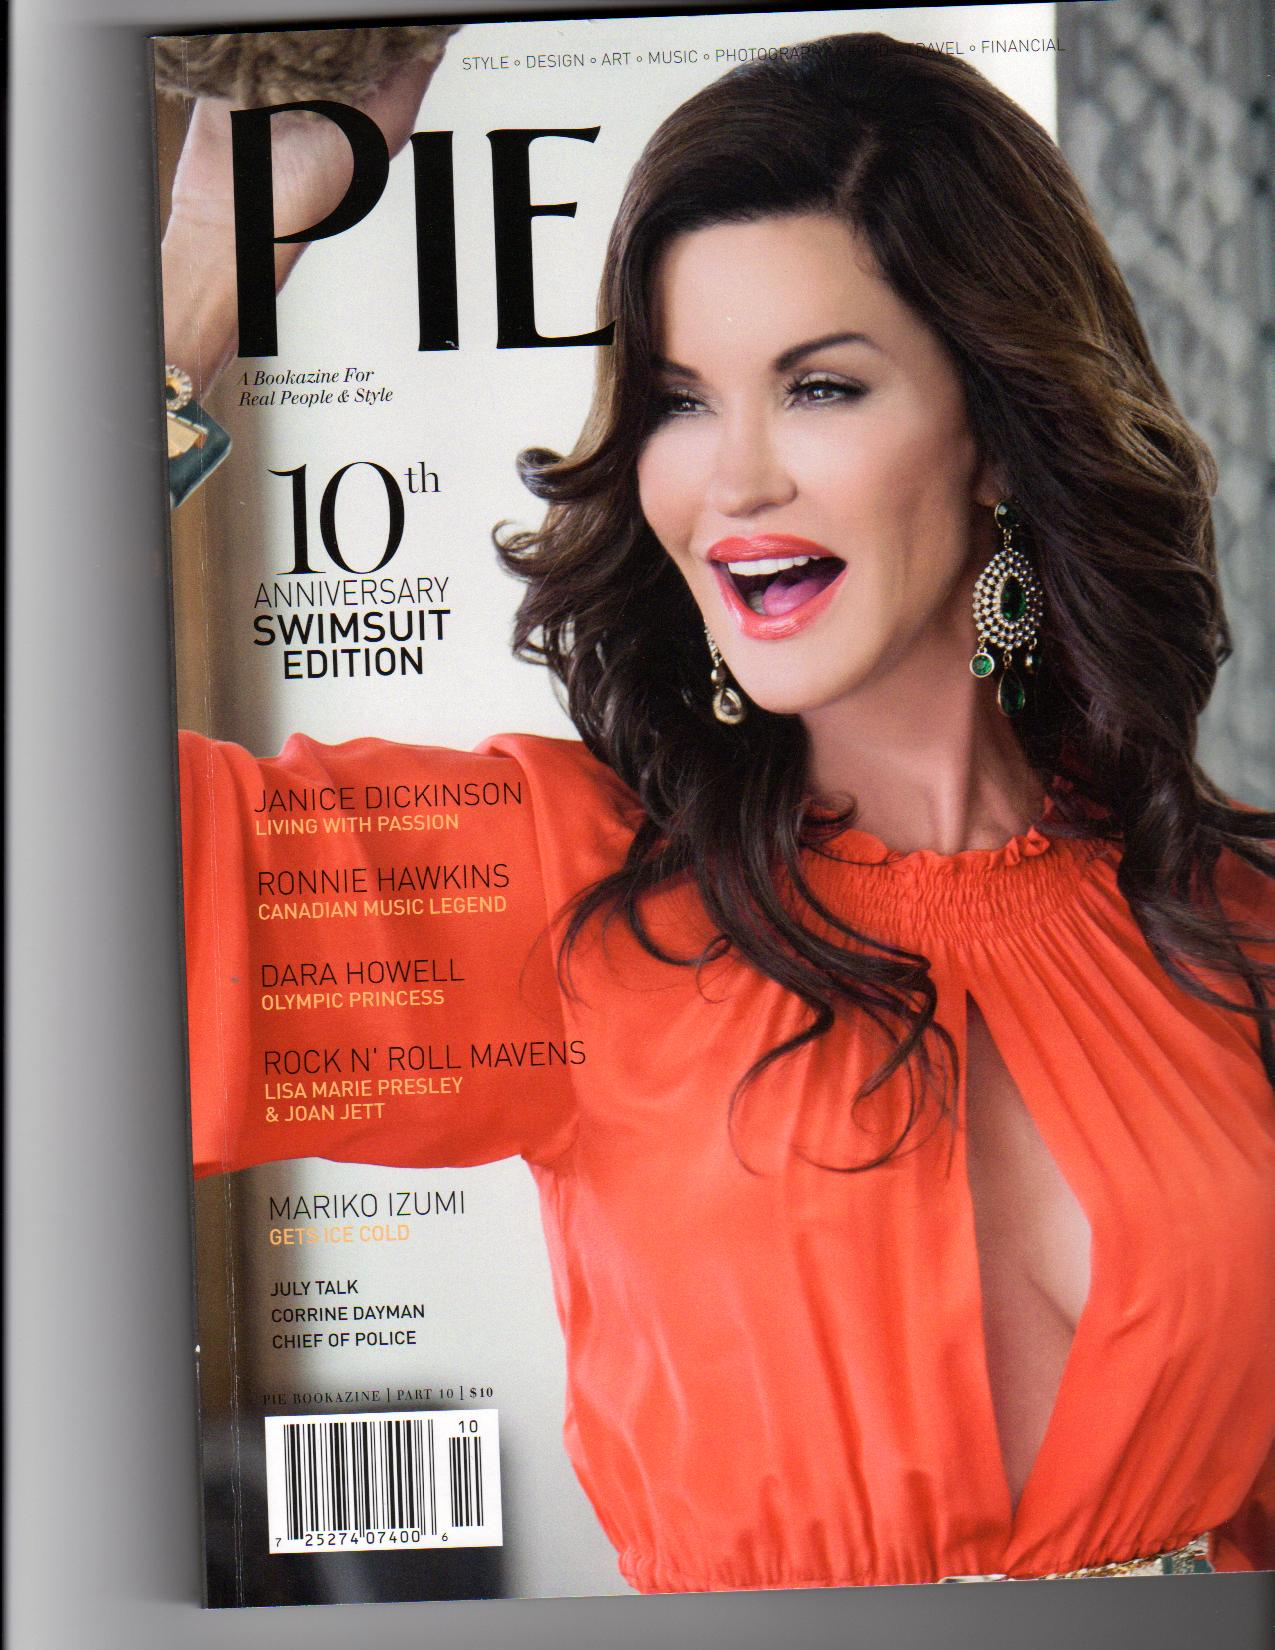 PIE Magazine Cover